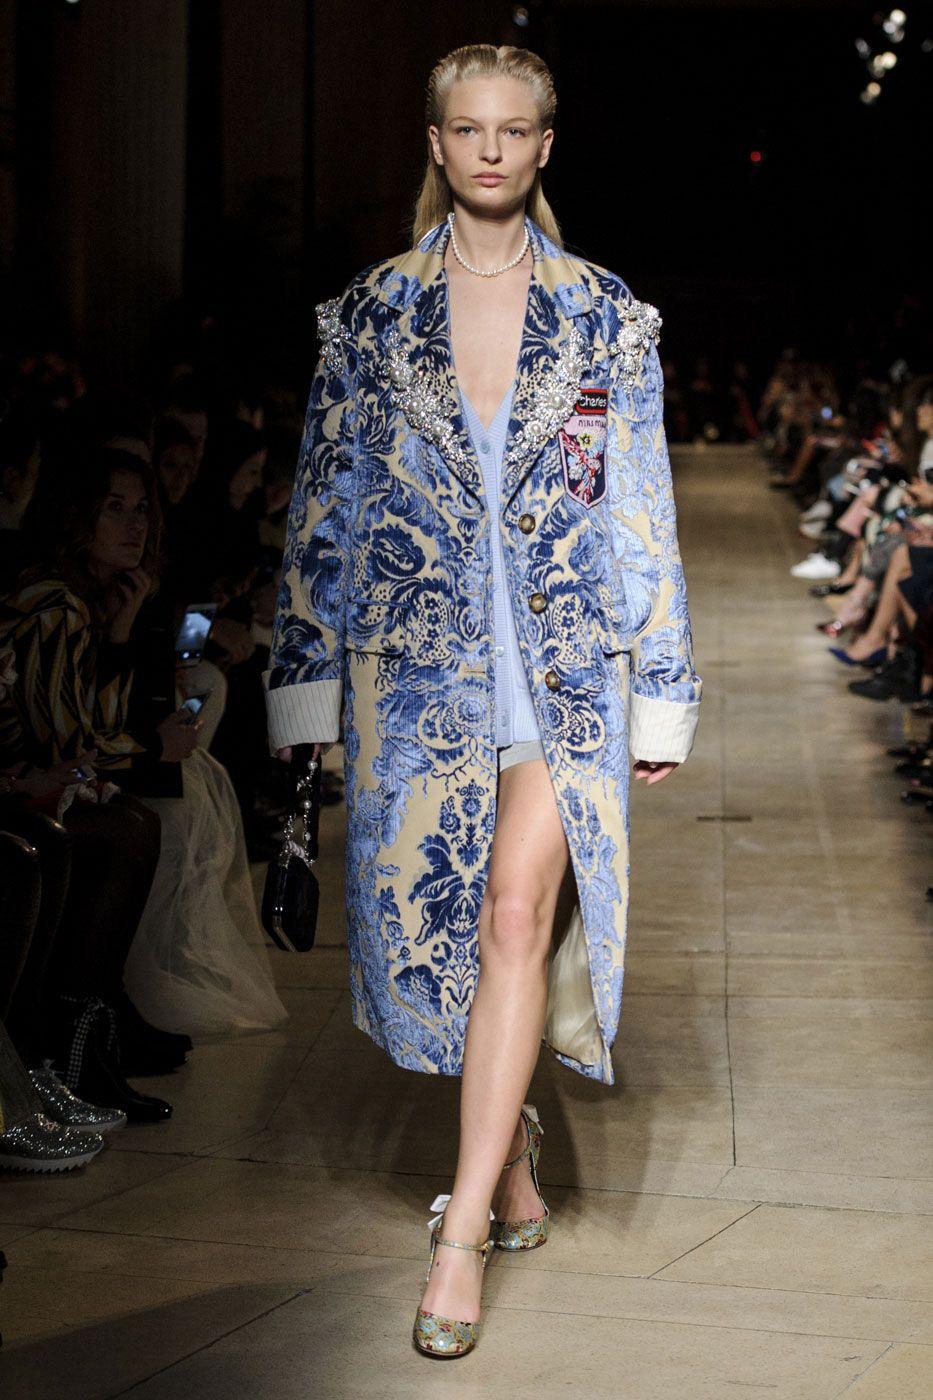 Miu Miu Autumn/Winter 2016-17 #PFW | Fashion, Fashion week ...